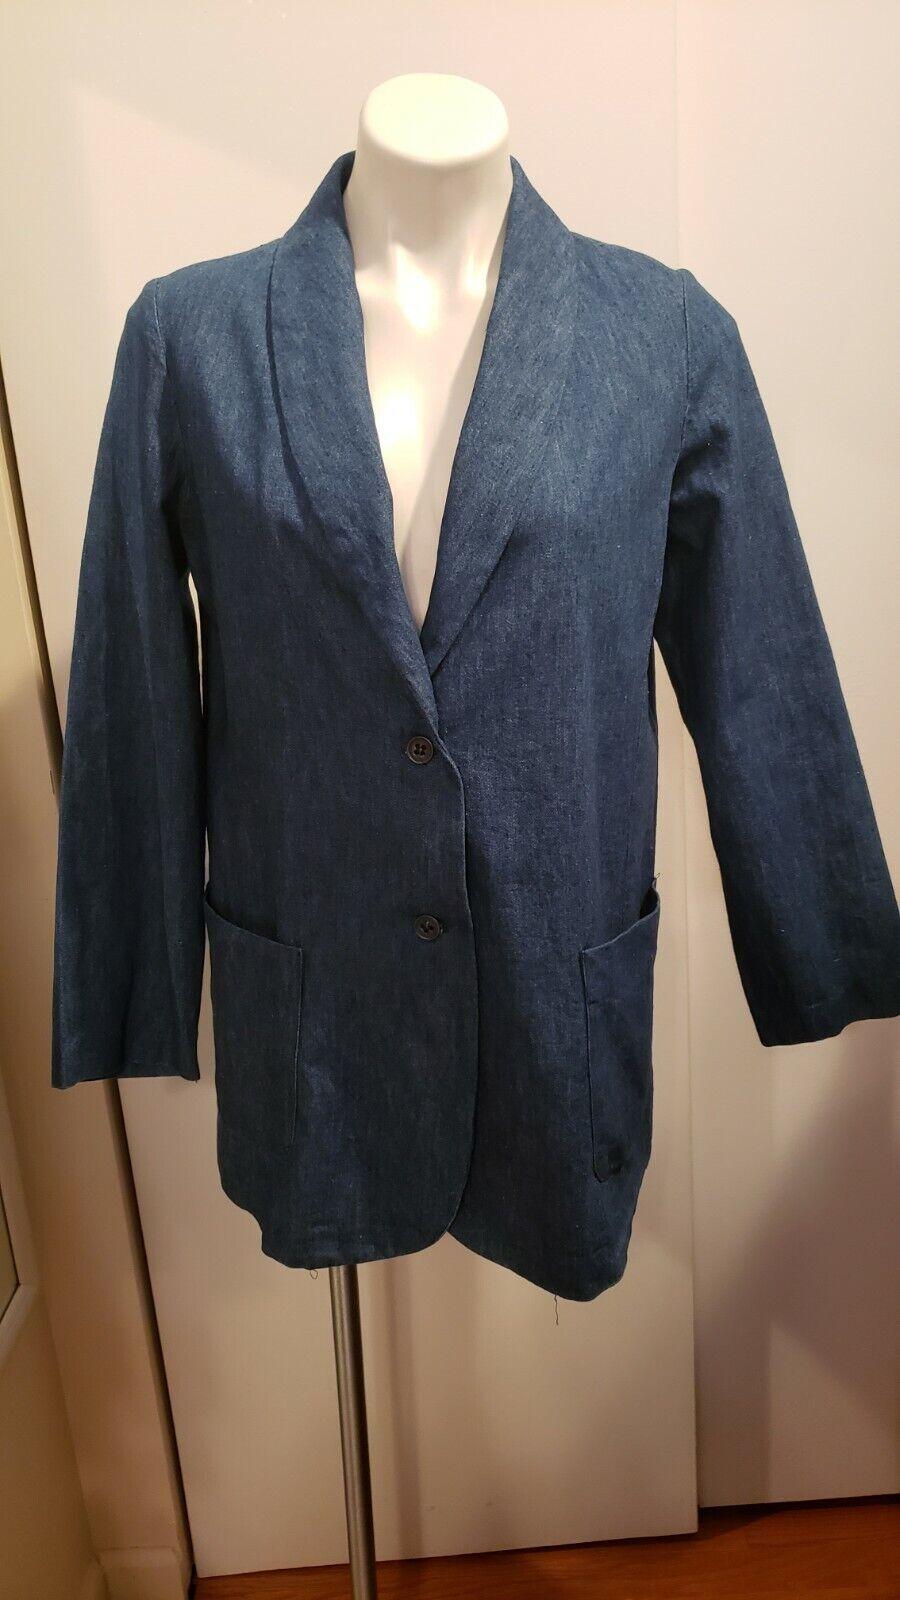 Vintage Women's Shawl Collar Denim Single-Breasted Blazer Jacket by REBORN Sz10